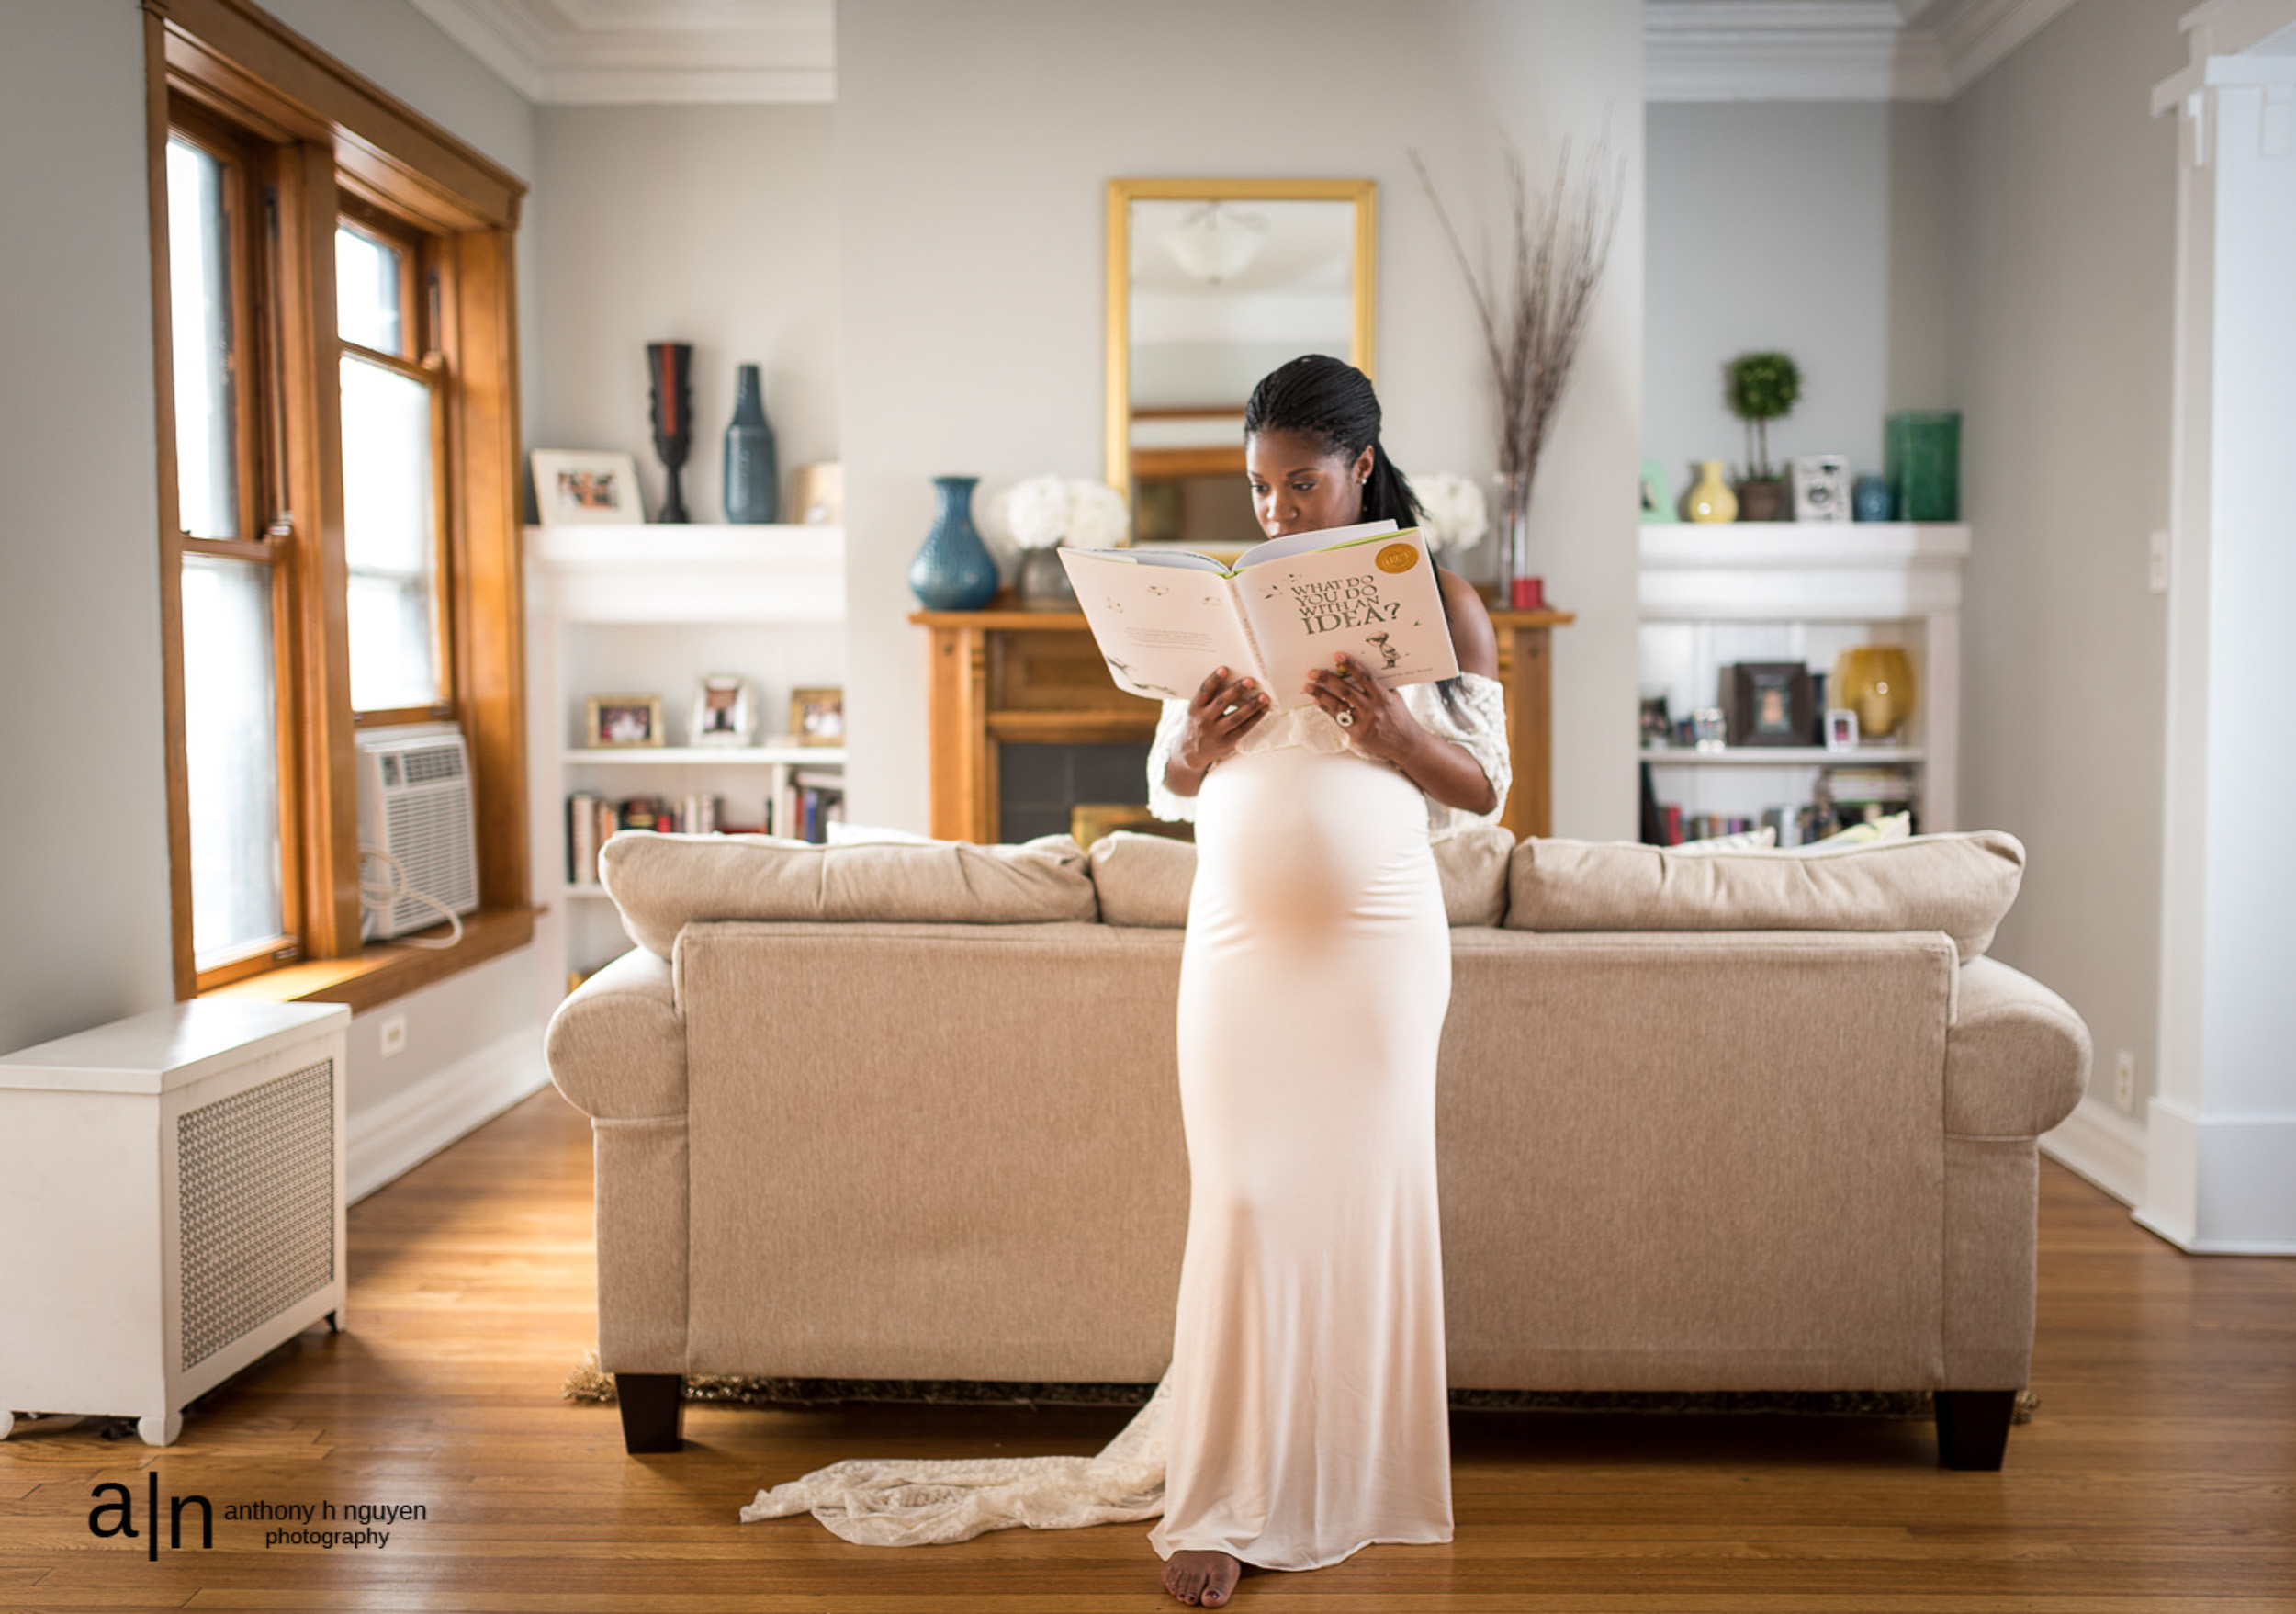 ahnp_courtney_shaun_maternity_blog-003.jpg